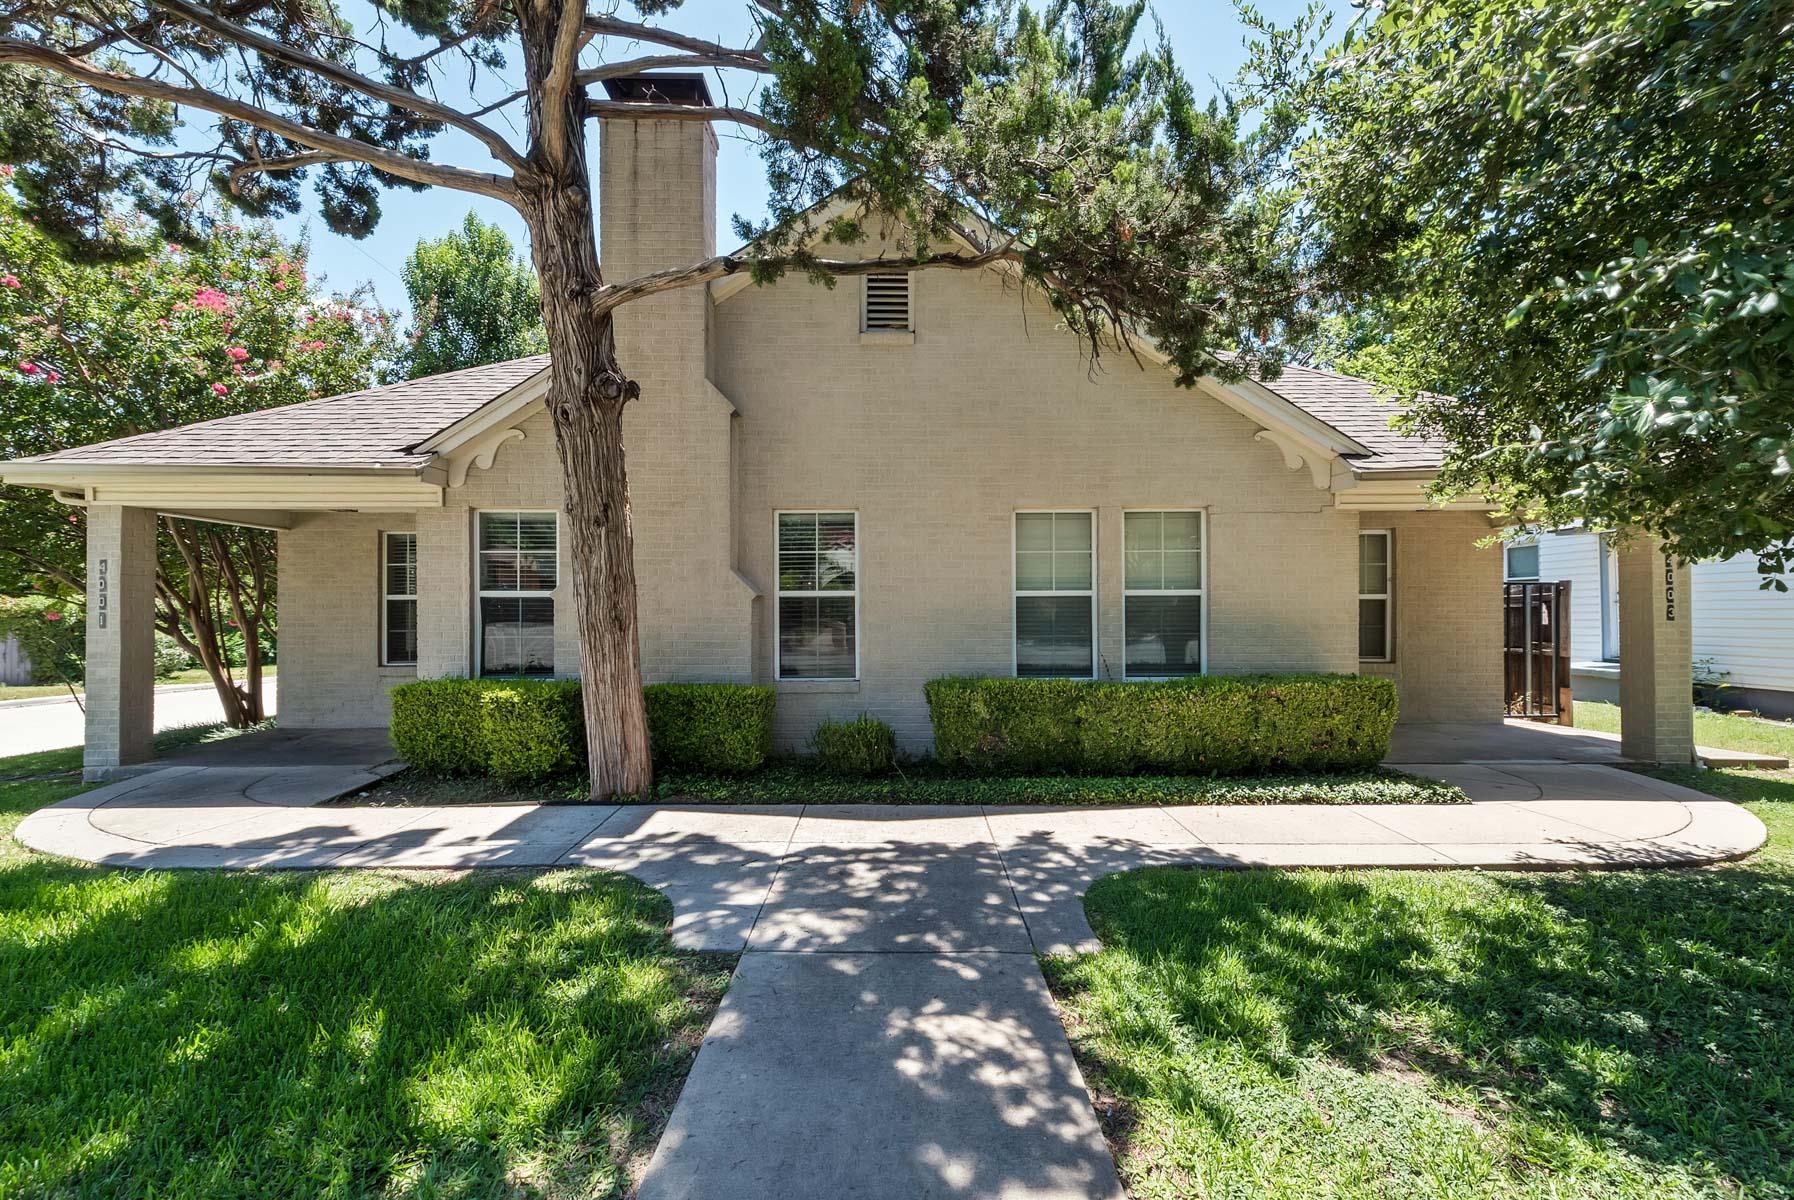 Maison multifamiliale pour l Vente à Nicely Redone Triplex in the heart of Arlington Heights 4001 El Campo Ave. Fort Worth, Texas, 76107 États-Unis